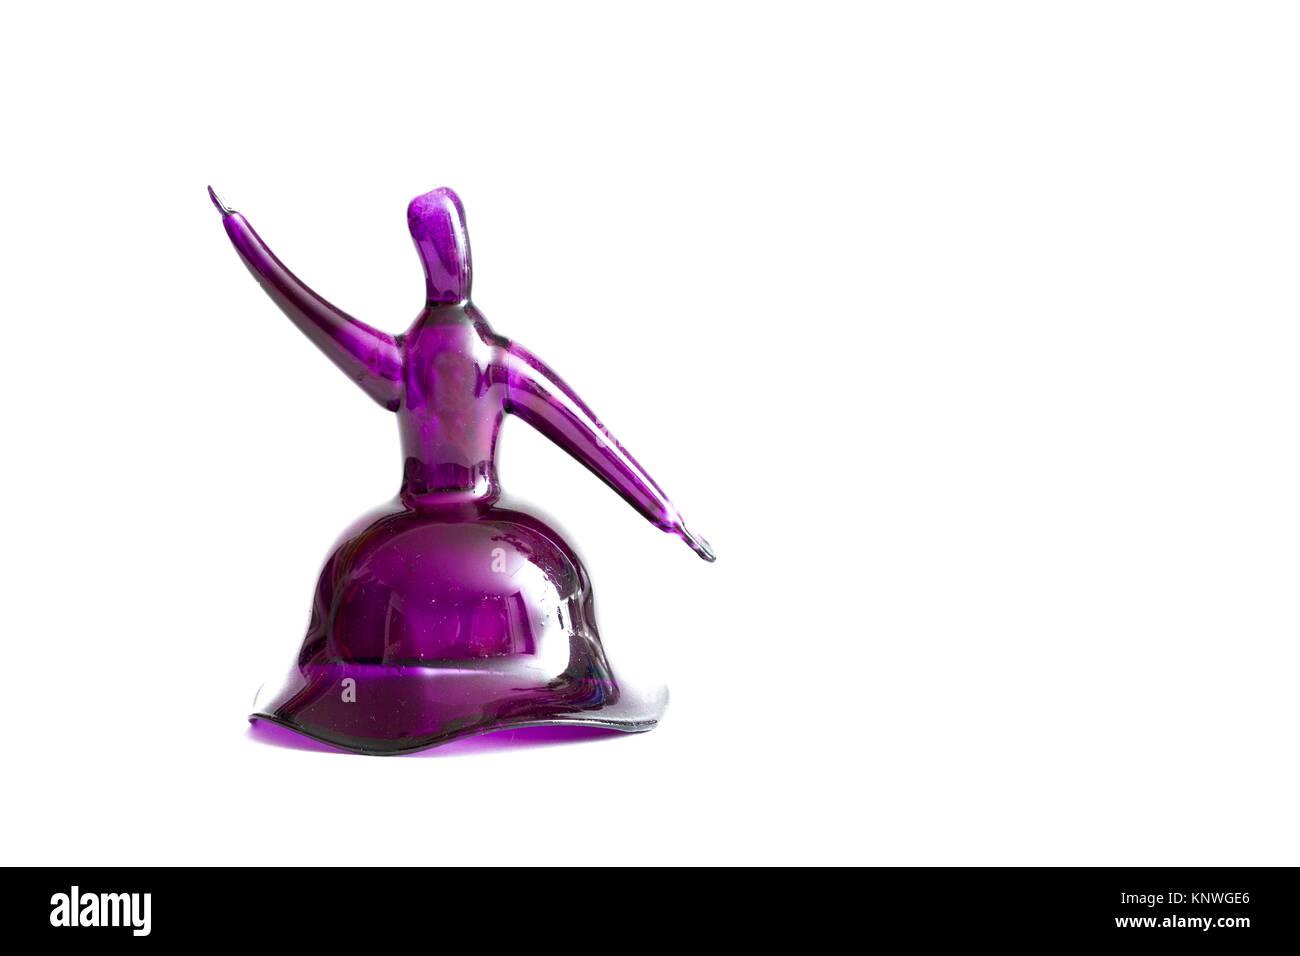 Purple handmade glass semazen figurine on white background - Stock Image